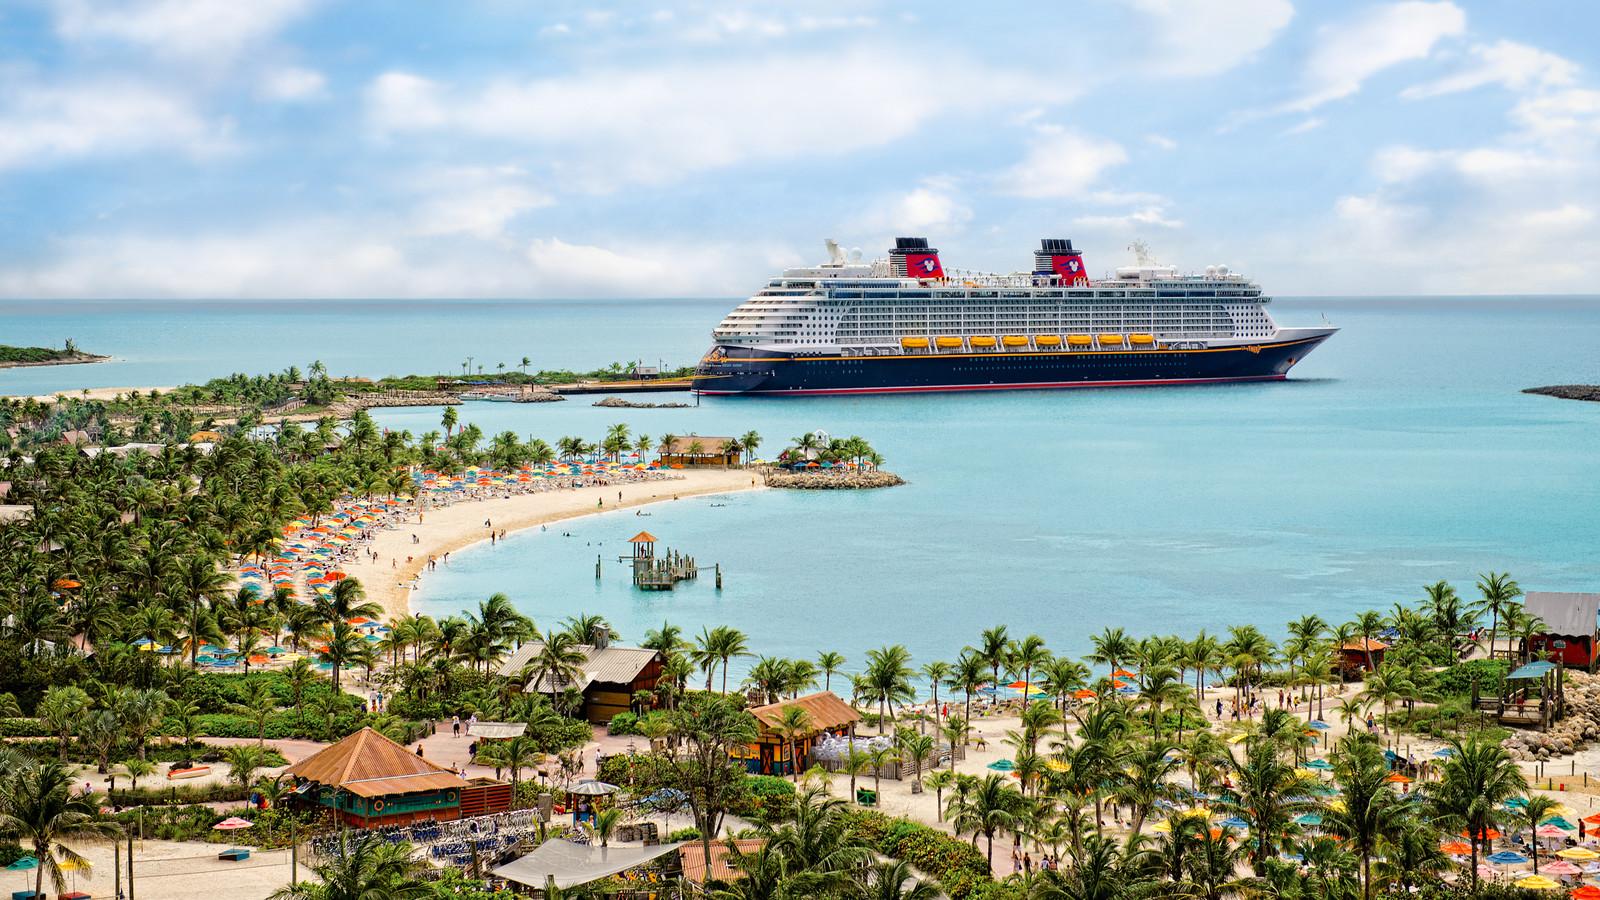 Castaway Key Disney Cruise Line island